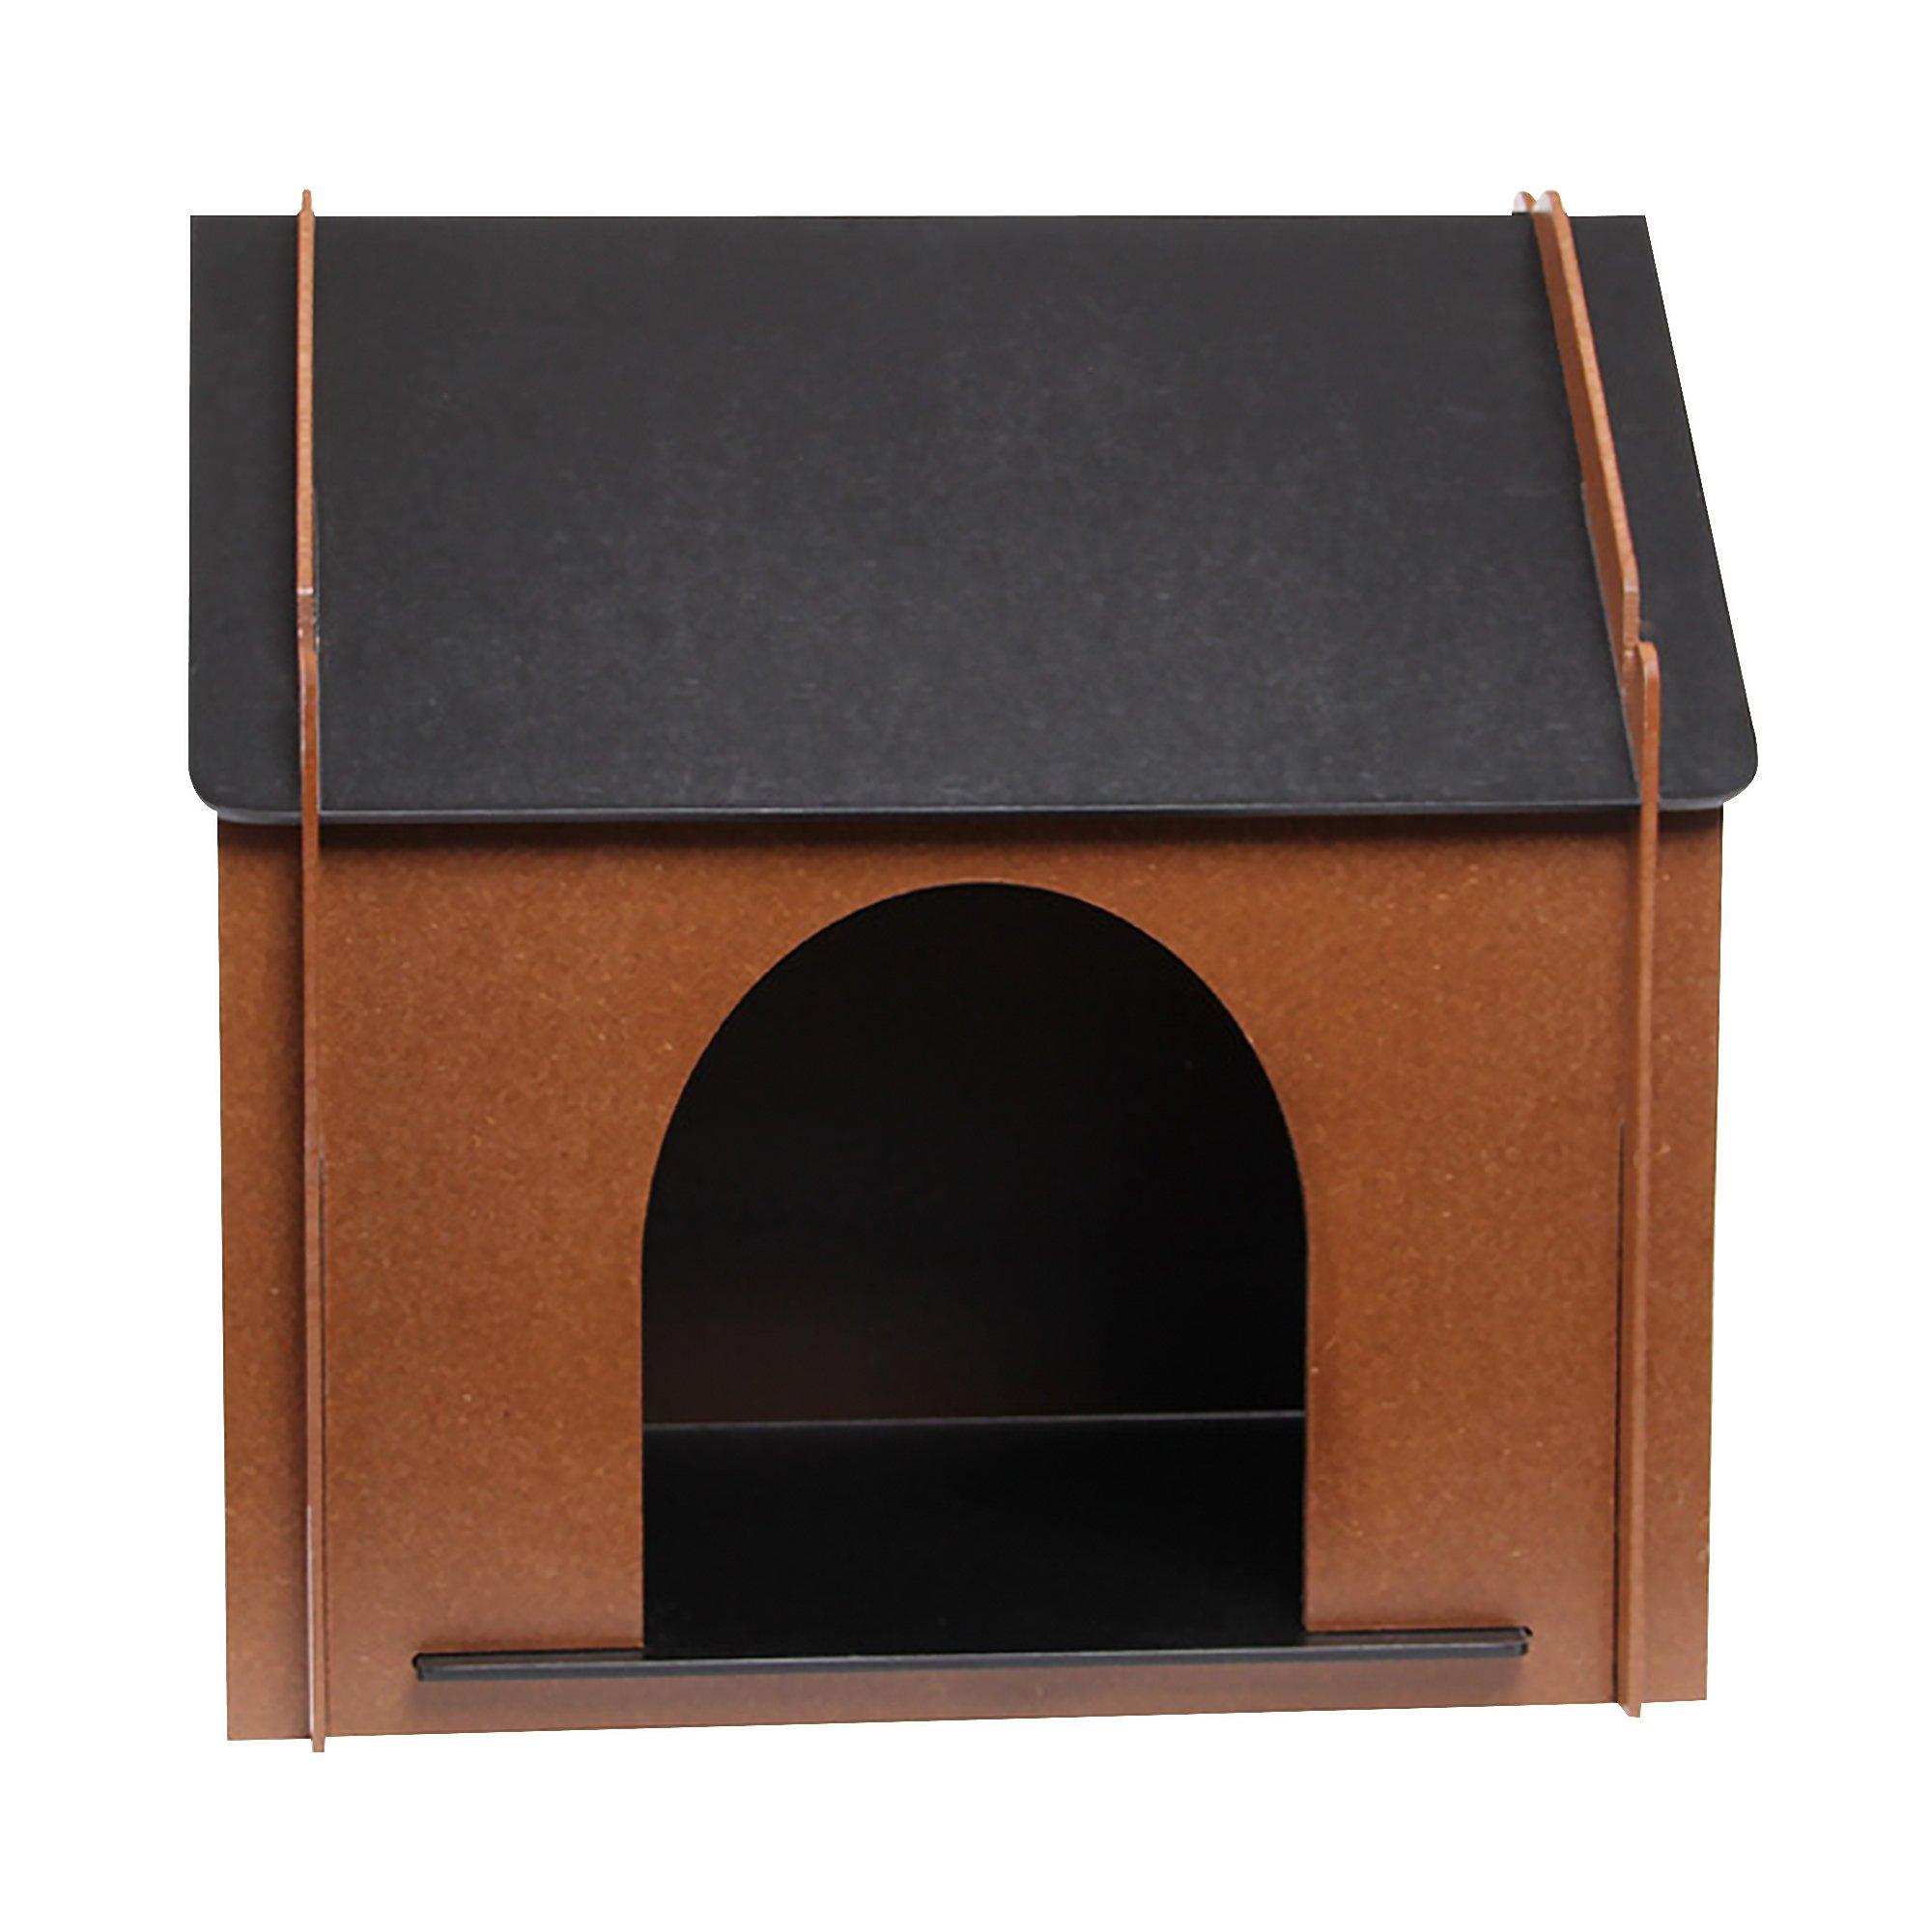 Indoor Wooden Pet Dog House Kennel